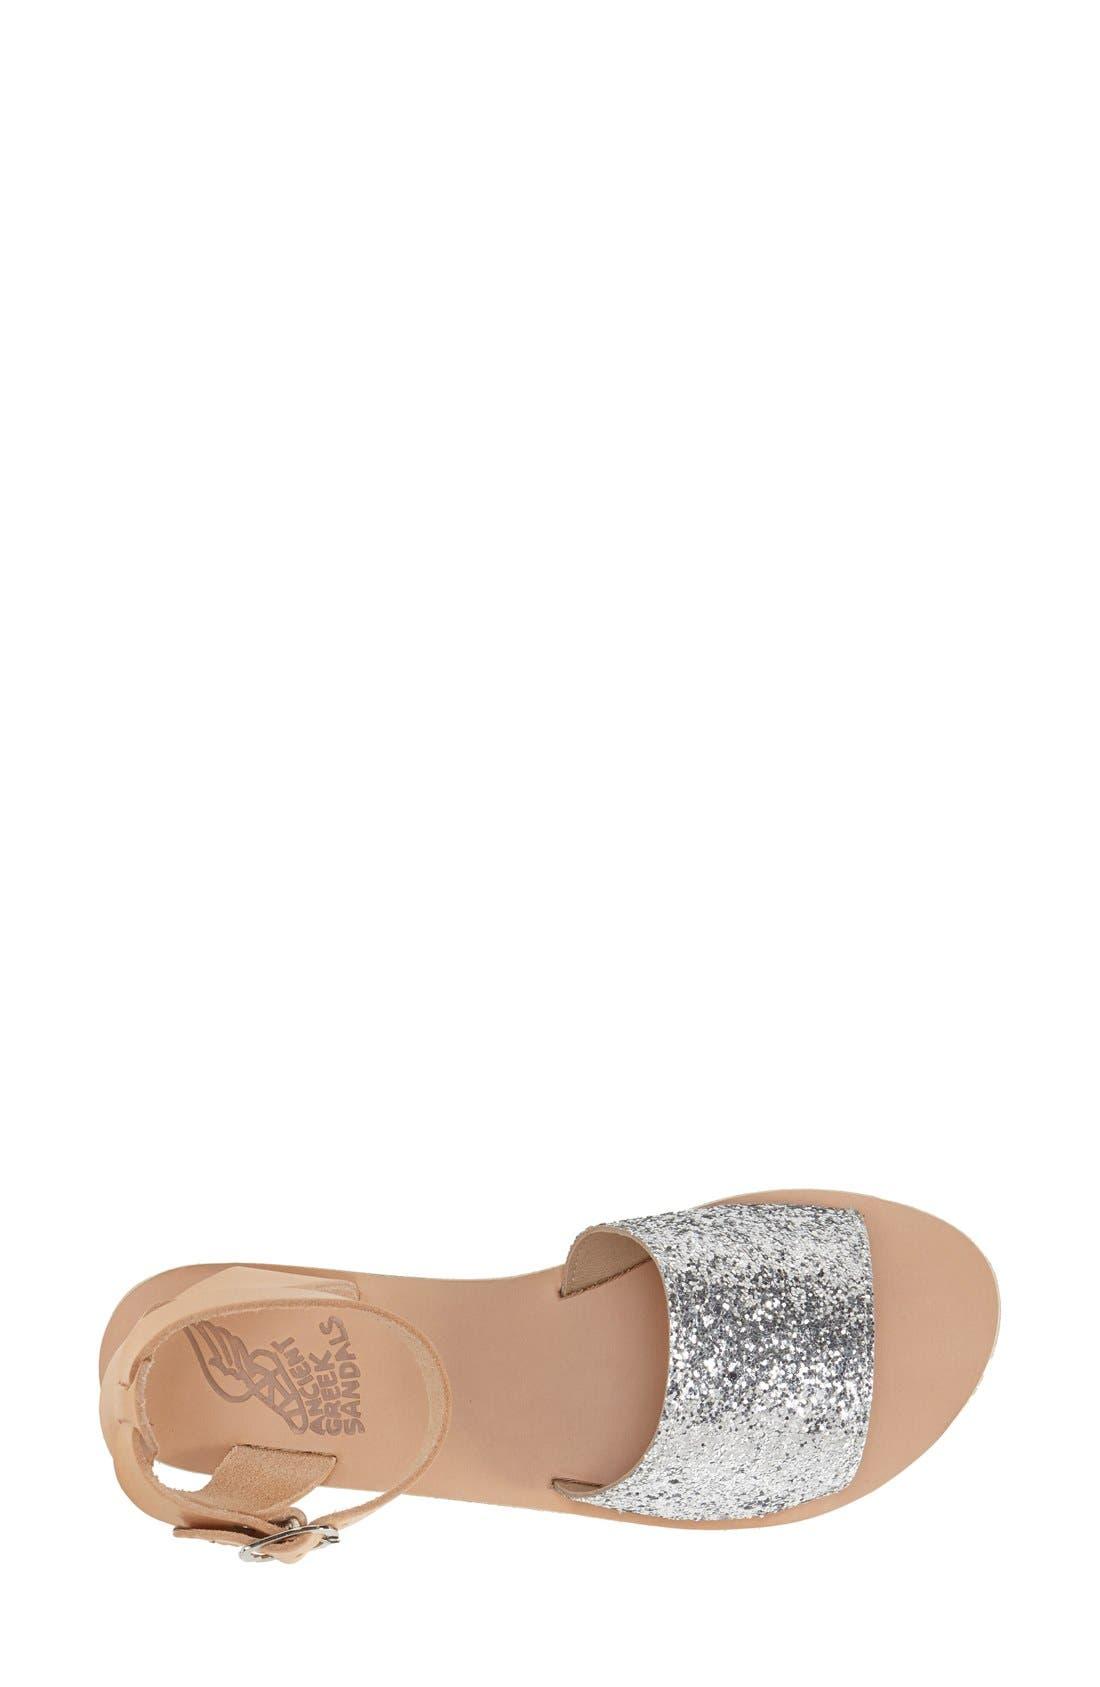 Alternate Image 3  - Ancient Greek Sandals 'Thalpori' Leather Ankle Strap Sandal (Women)